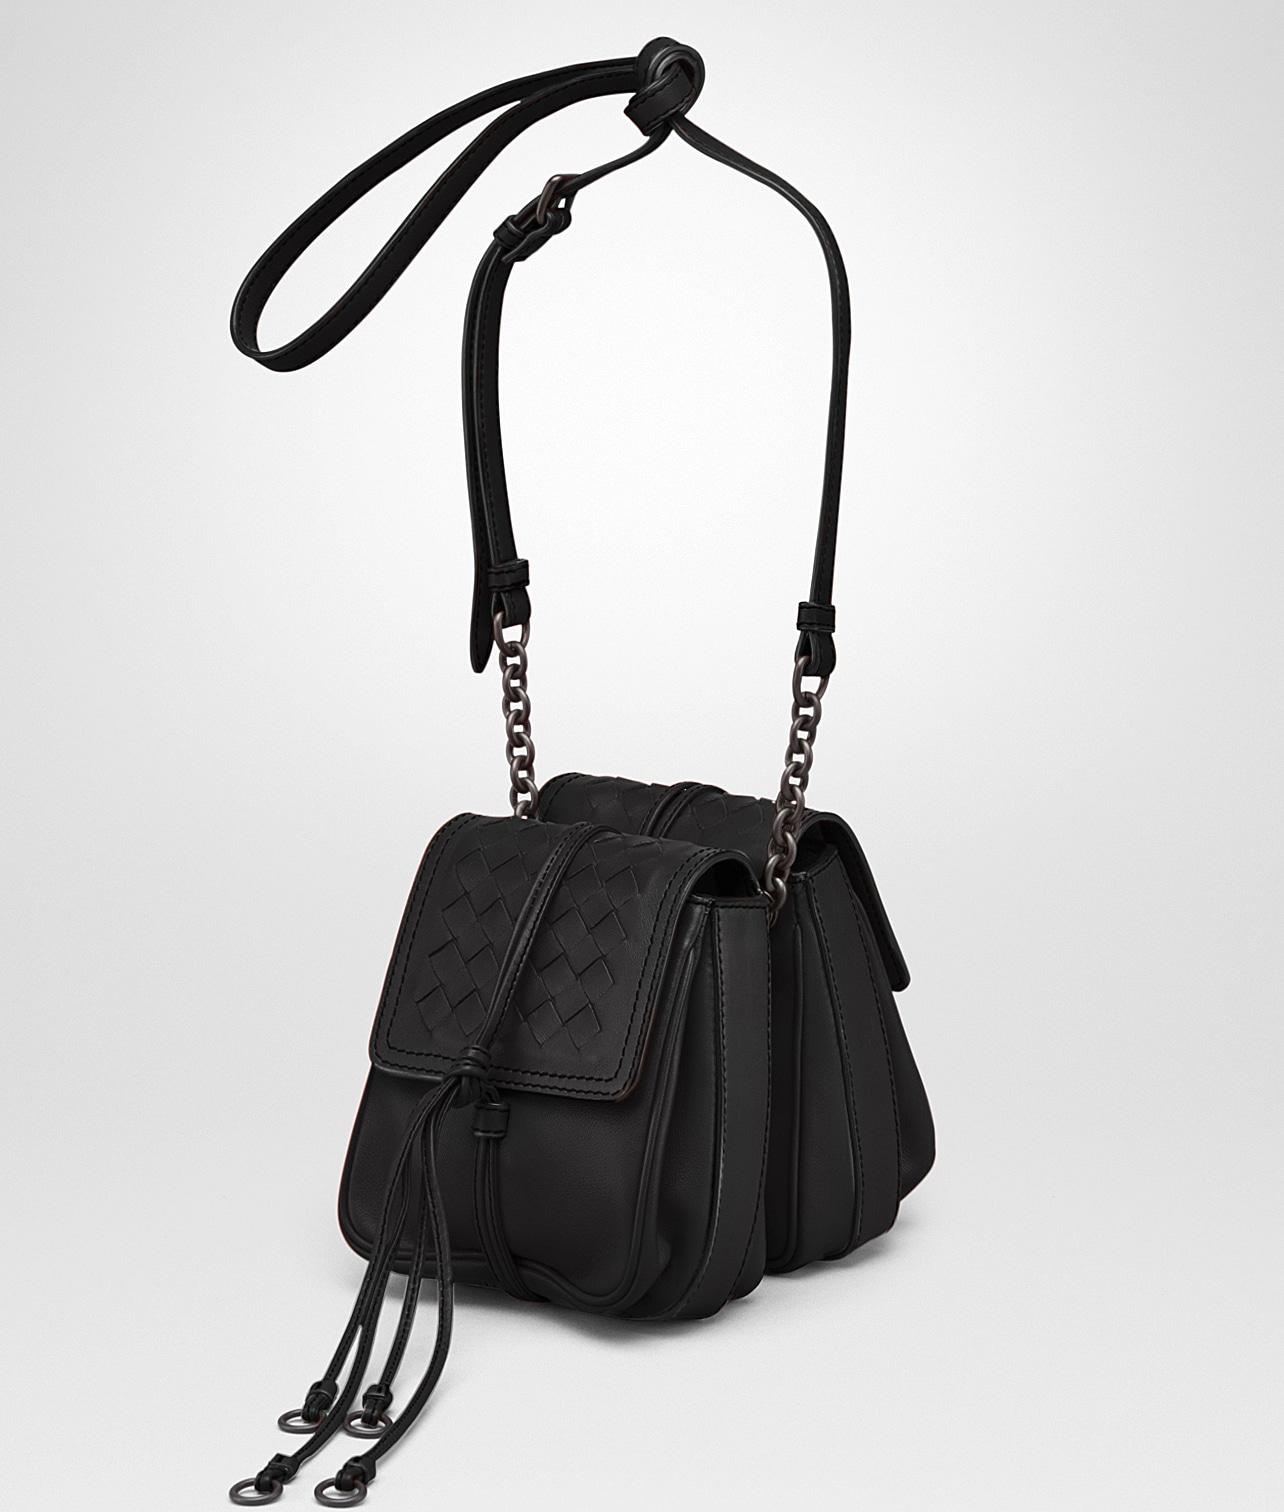 Intrecciato Leather Shoulder Bag - Black Bottega Veneta lWwTk4